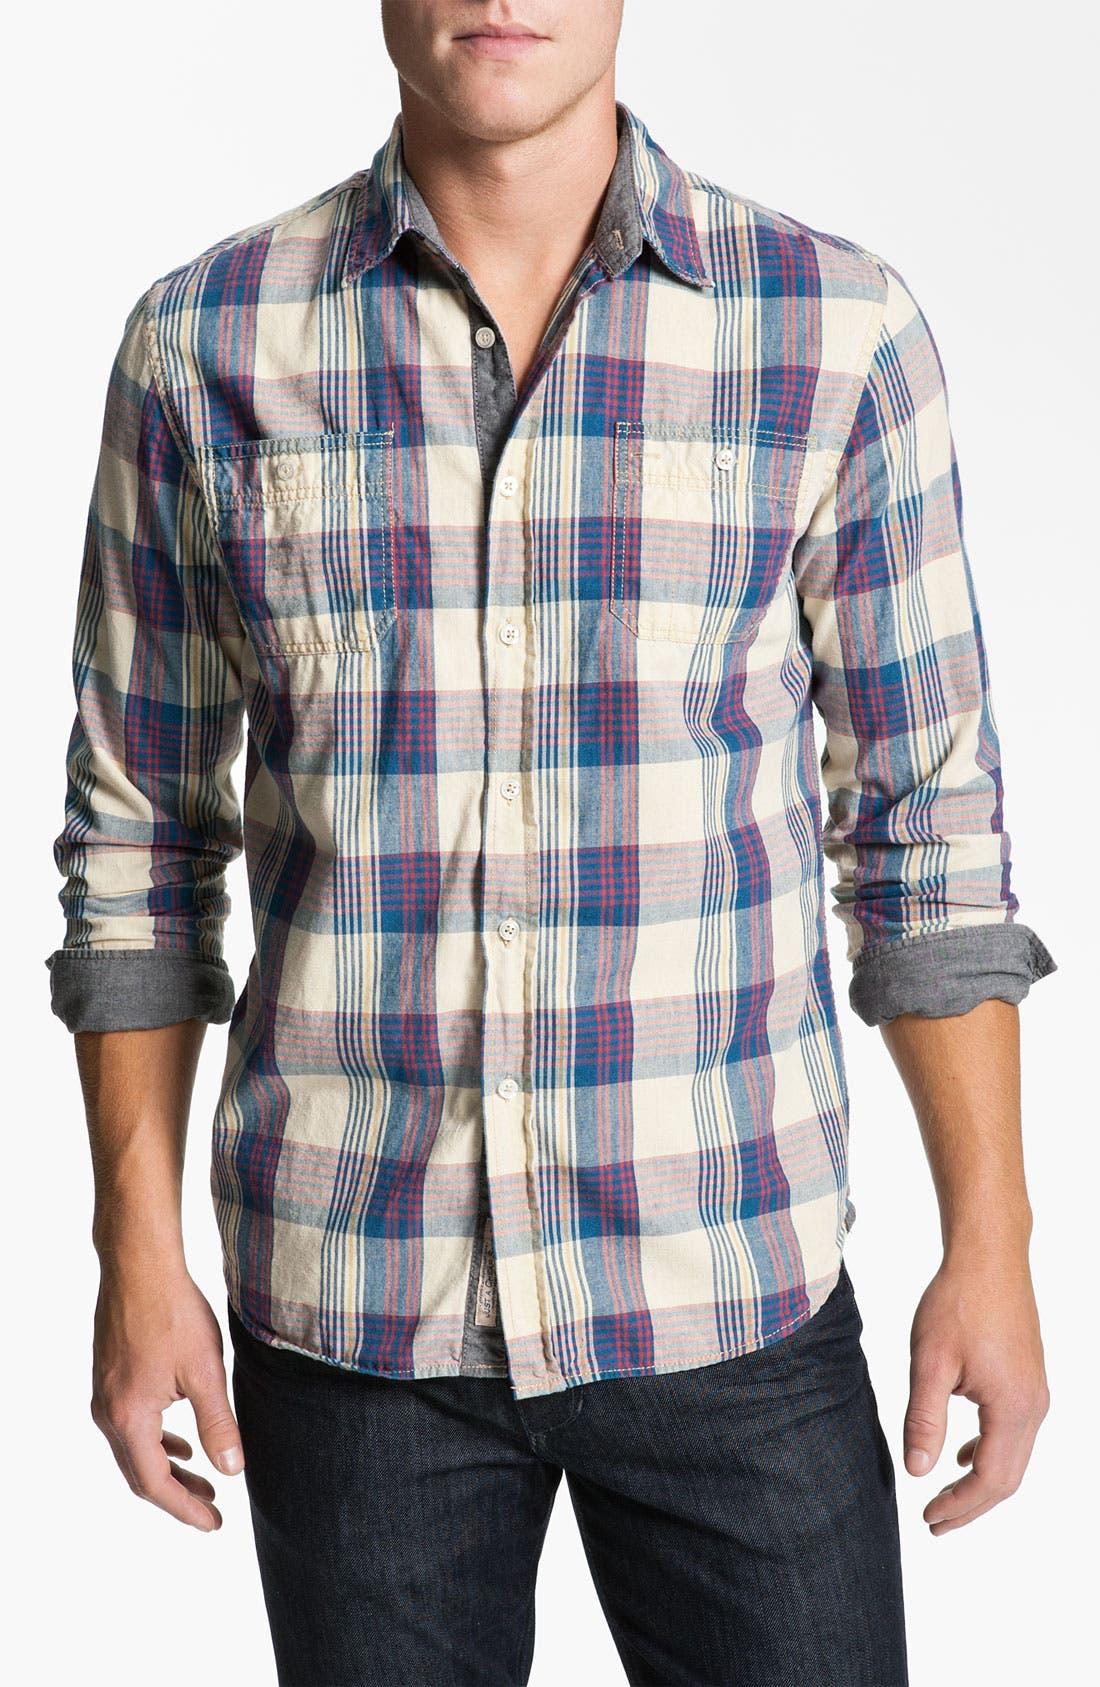 Main Image - Just A Cheap Shirt Plaid Woven Shirt